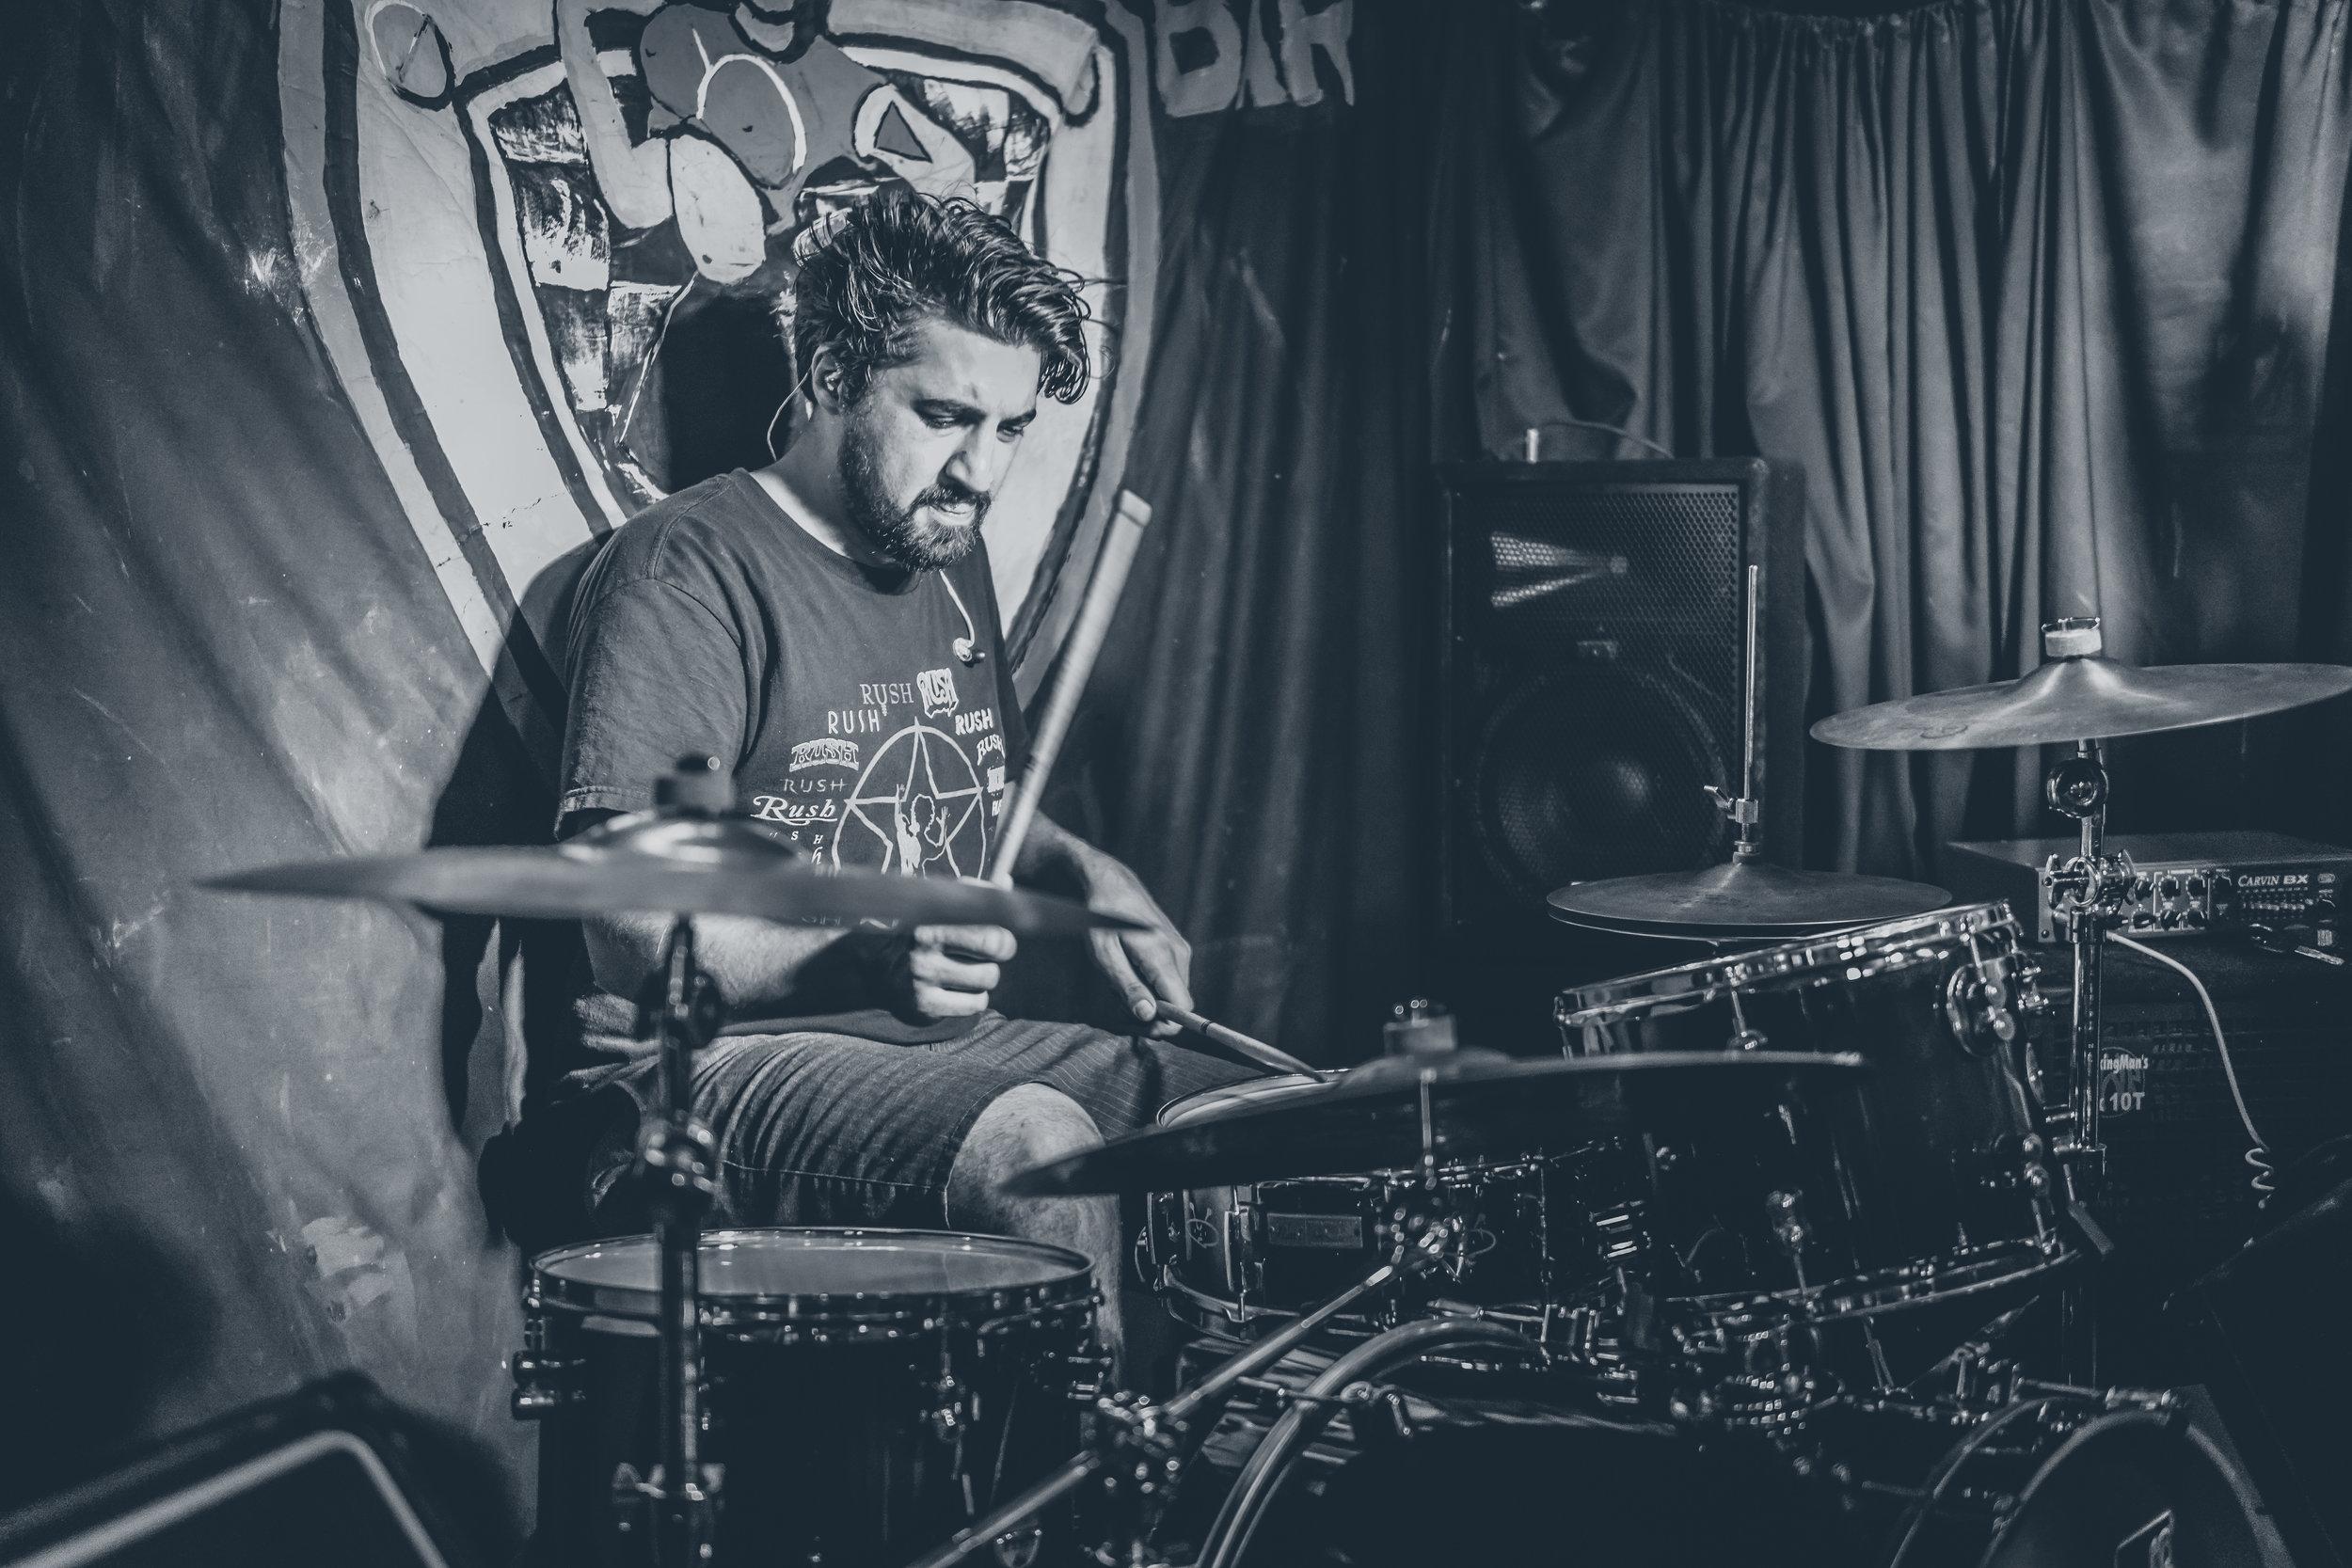 FM Pilots - Tulsa Rock Band - The Boobie Trap Bar Topeka, KS 070916-7.jpg